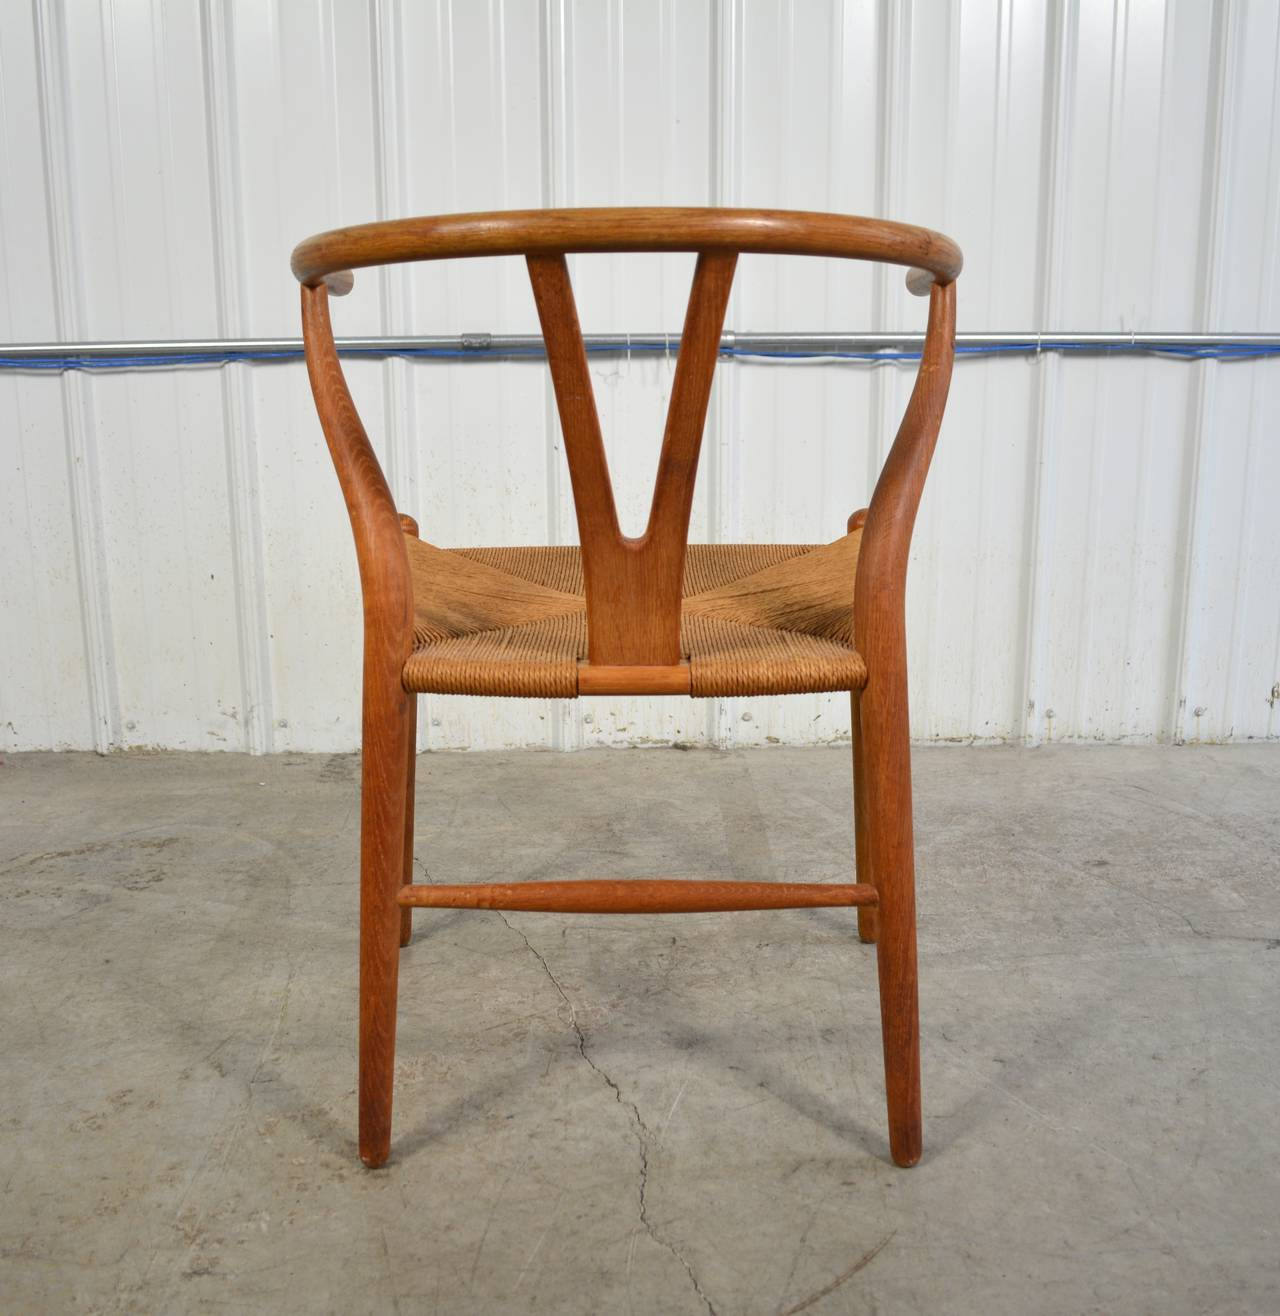 hans wegner set of six y chairs for sale at 1stdibs. Black Bedroom Furniture Sets. Home Design Ideas